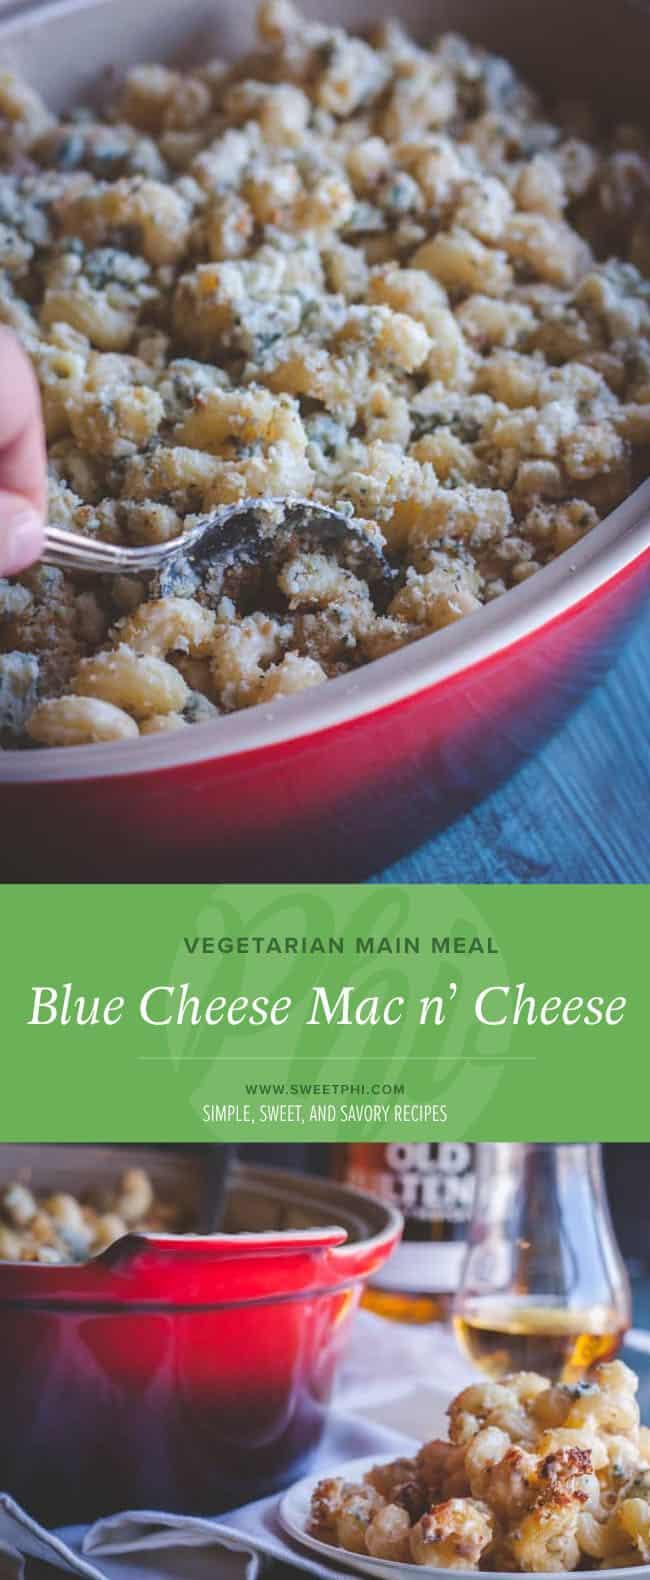 The best vegetarian blue cheese mac n' cheese